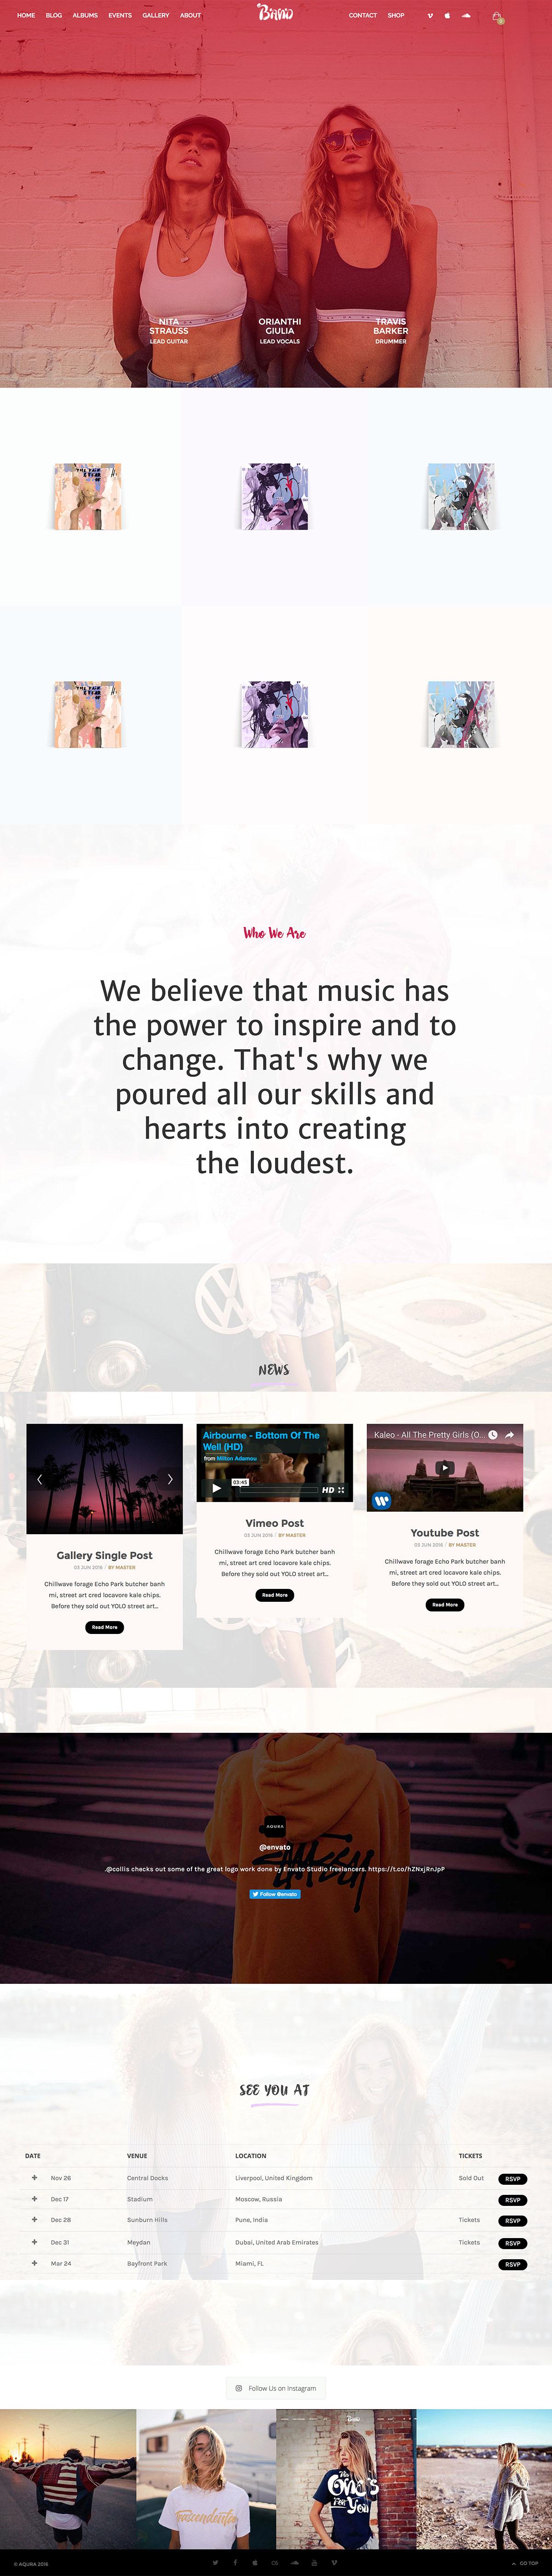 Best WordPress themes for Musicians - AQURA - Music Bands Musicians & DJ's WordPress Theme